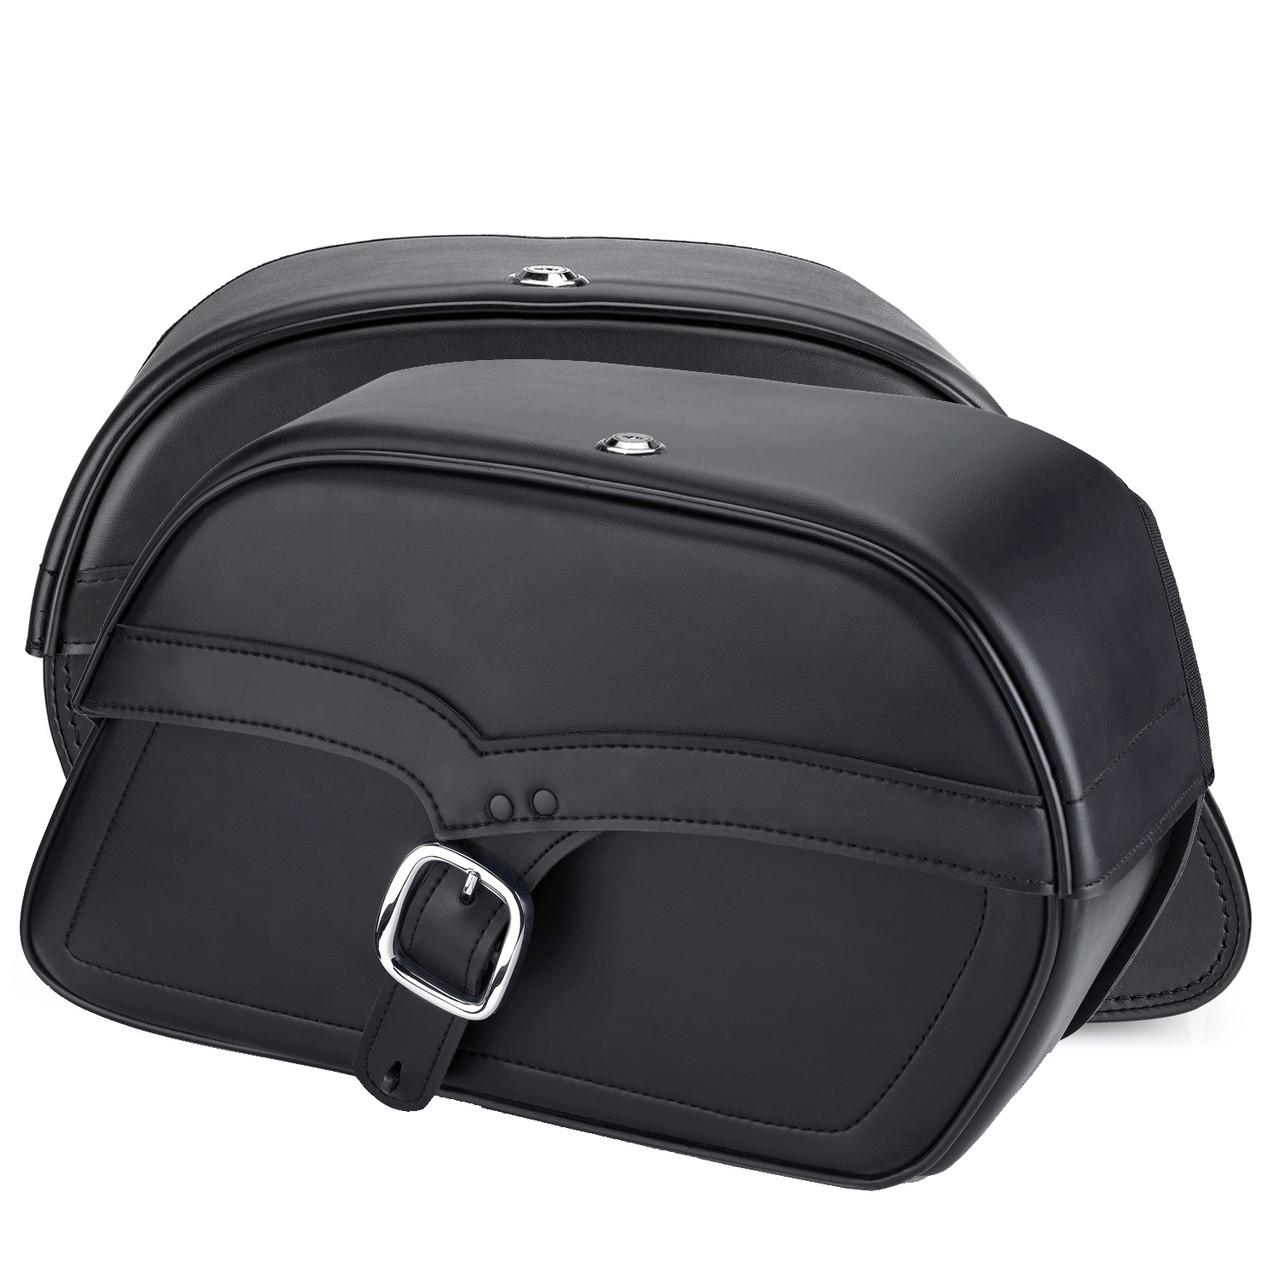 Charger Single Strap Medium Motorcycle Saddlebags Both Bags View